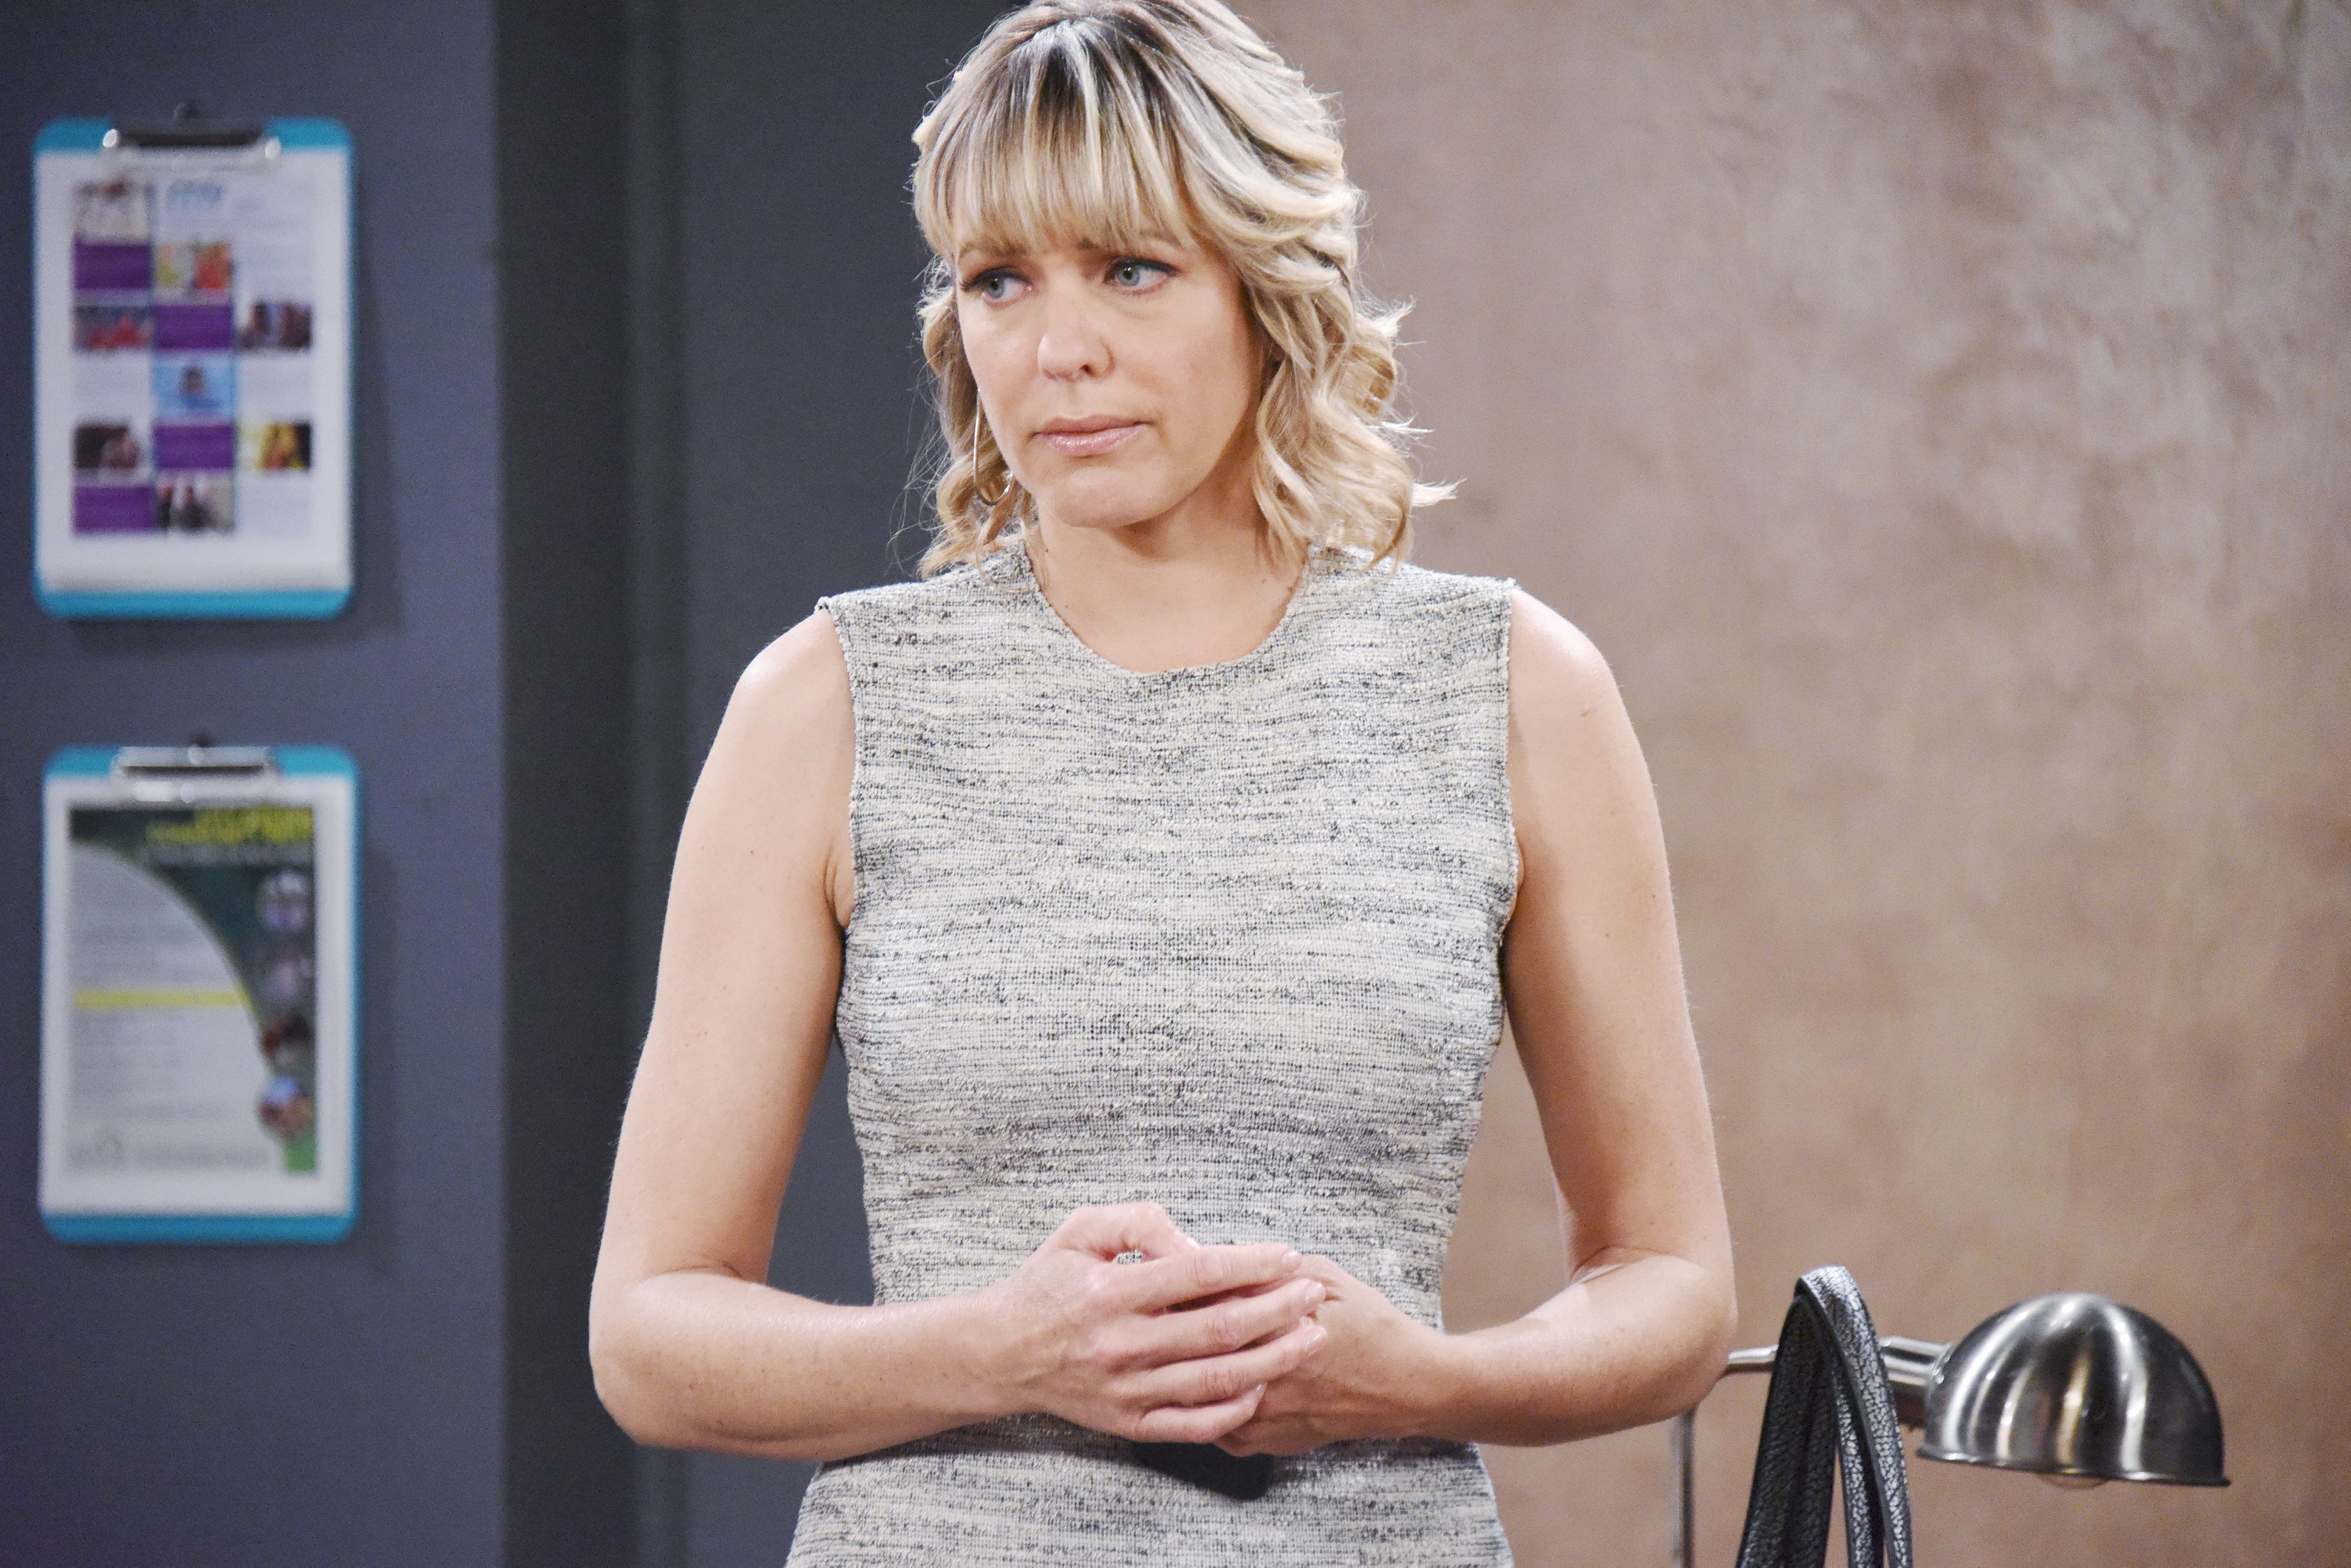 DOOL Spoilers: Nicole bids an emotional farewell to Salem.